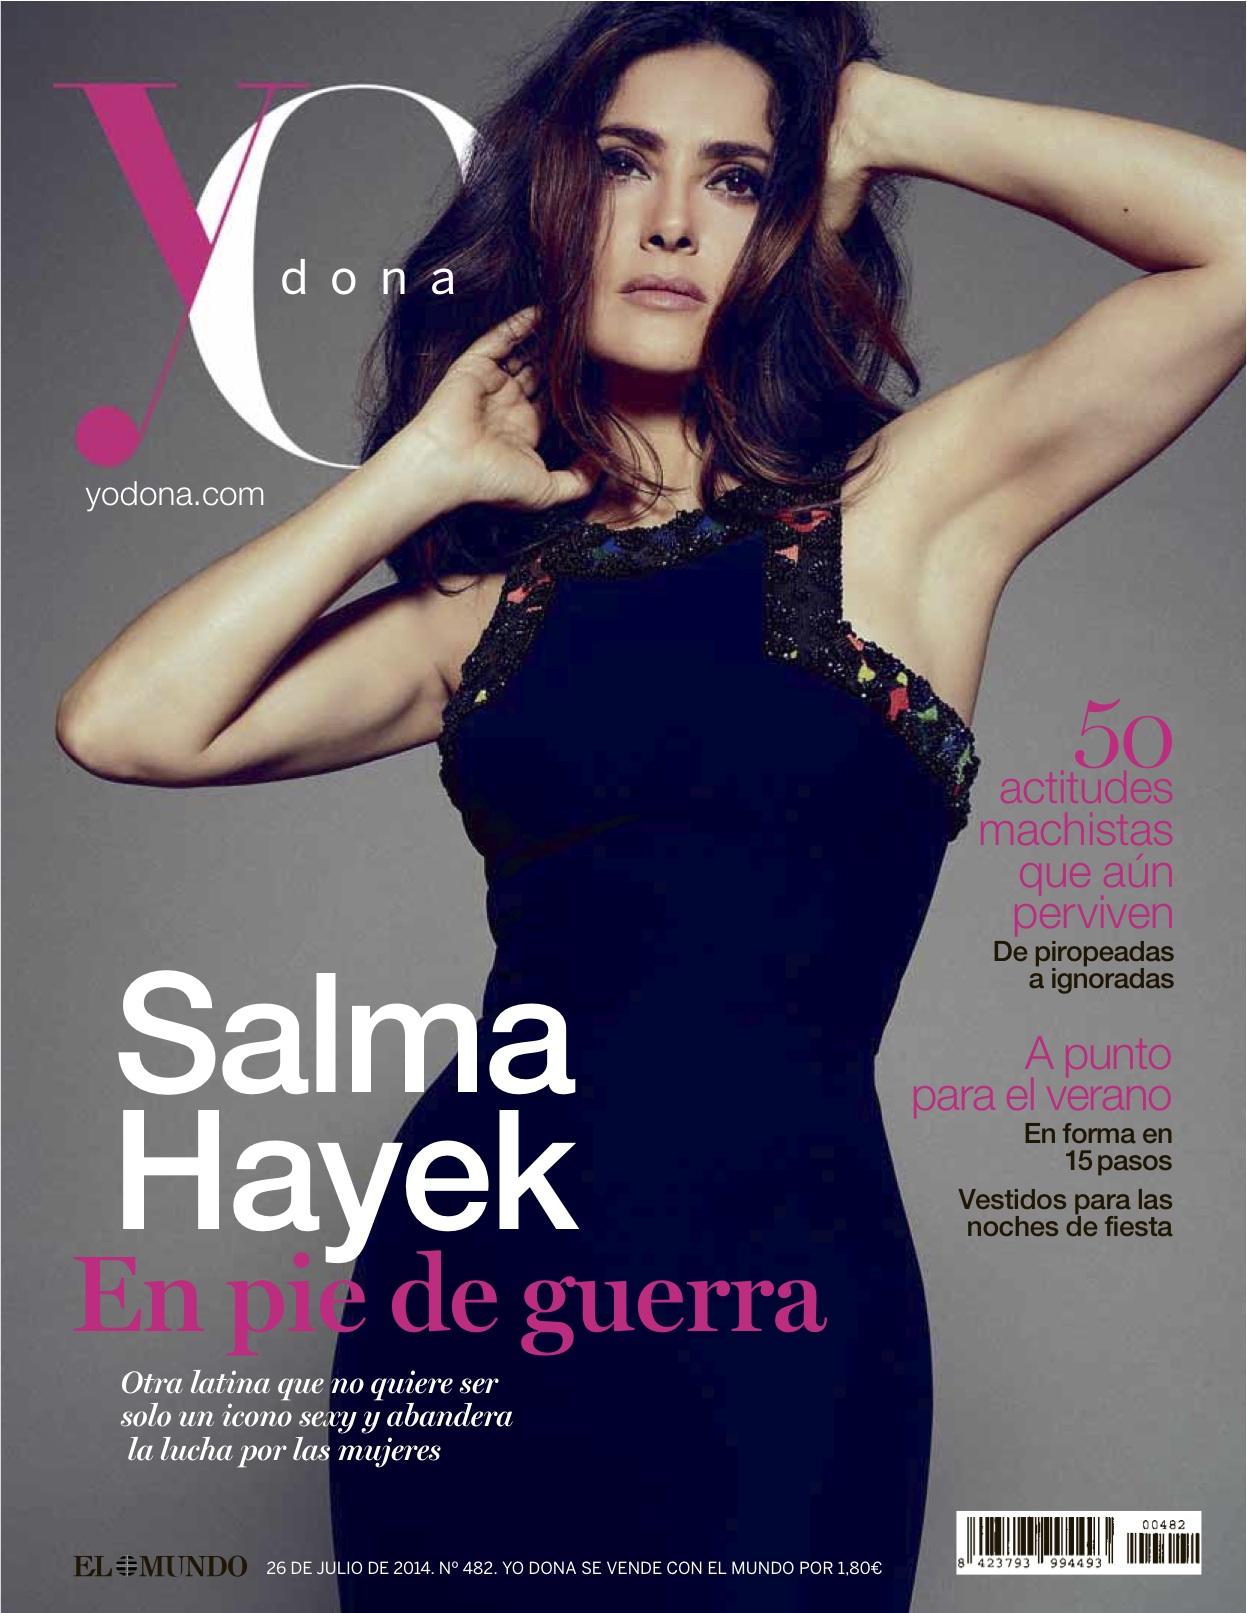 Yodona 482 Portada Salma Hayek 26 julio 2014.jpg